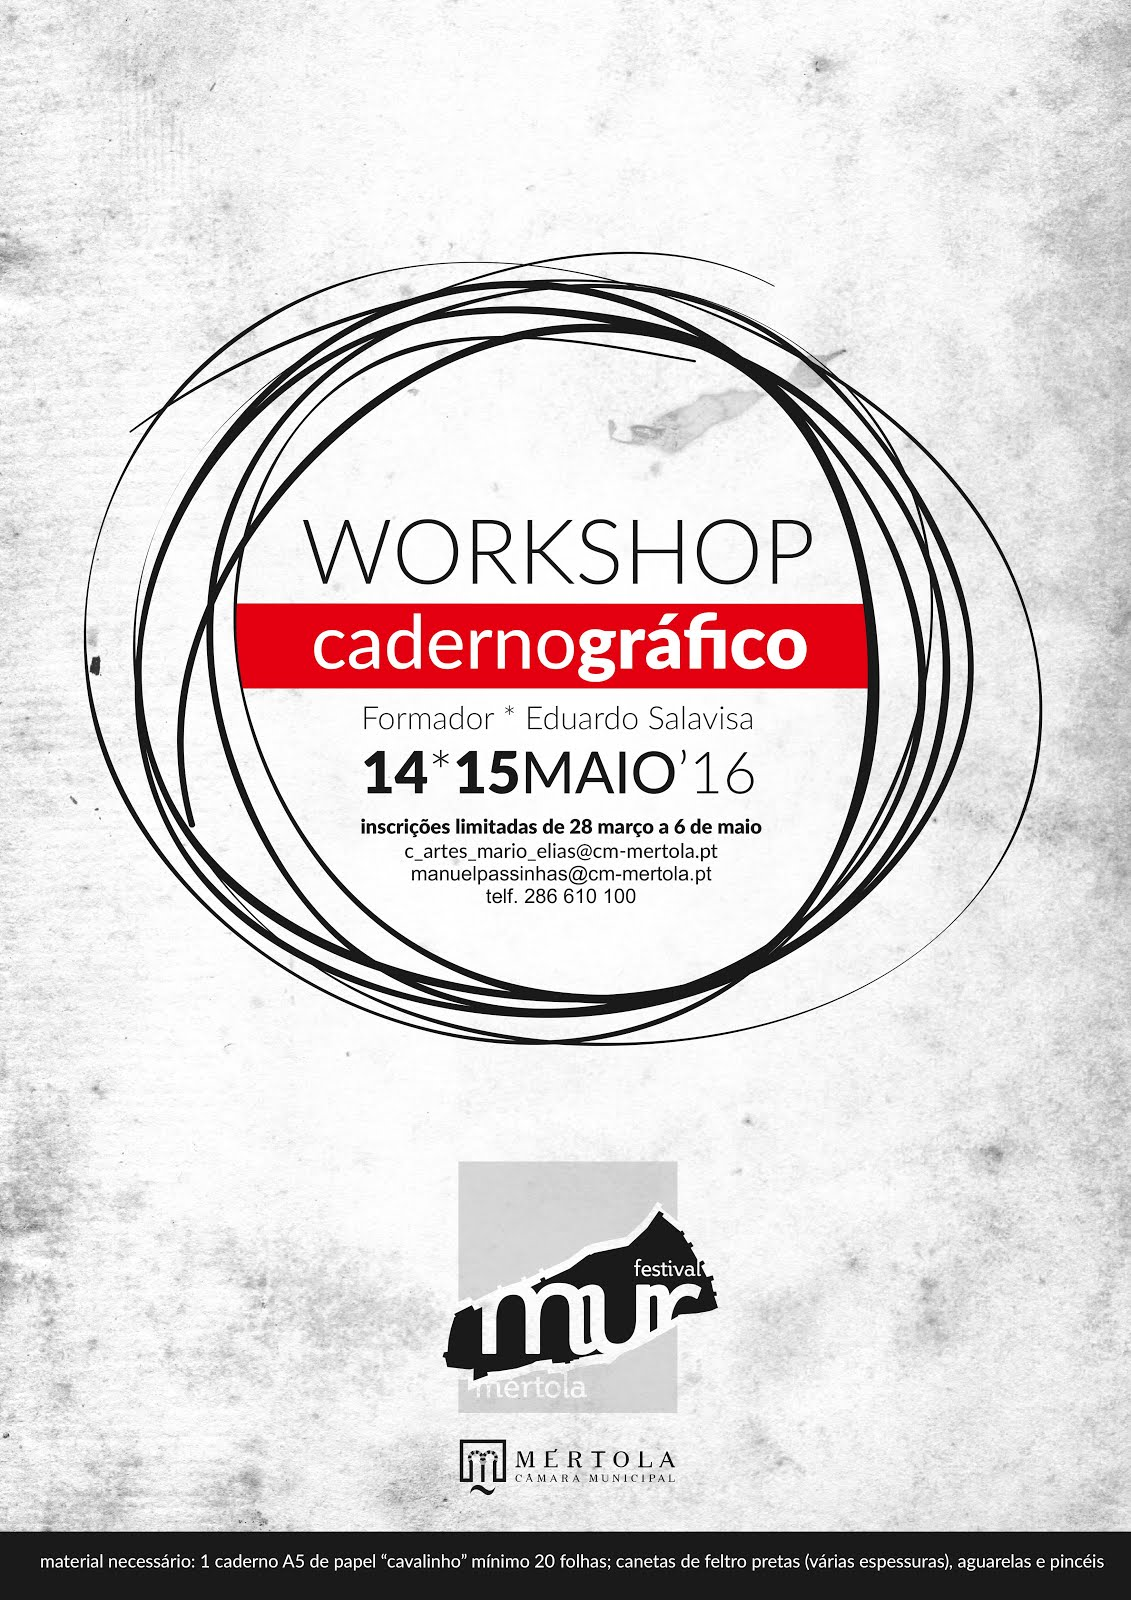 Workshop Caderno Gráfico - Mértola 14 e 15 de Maio 2016